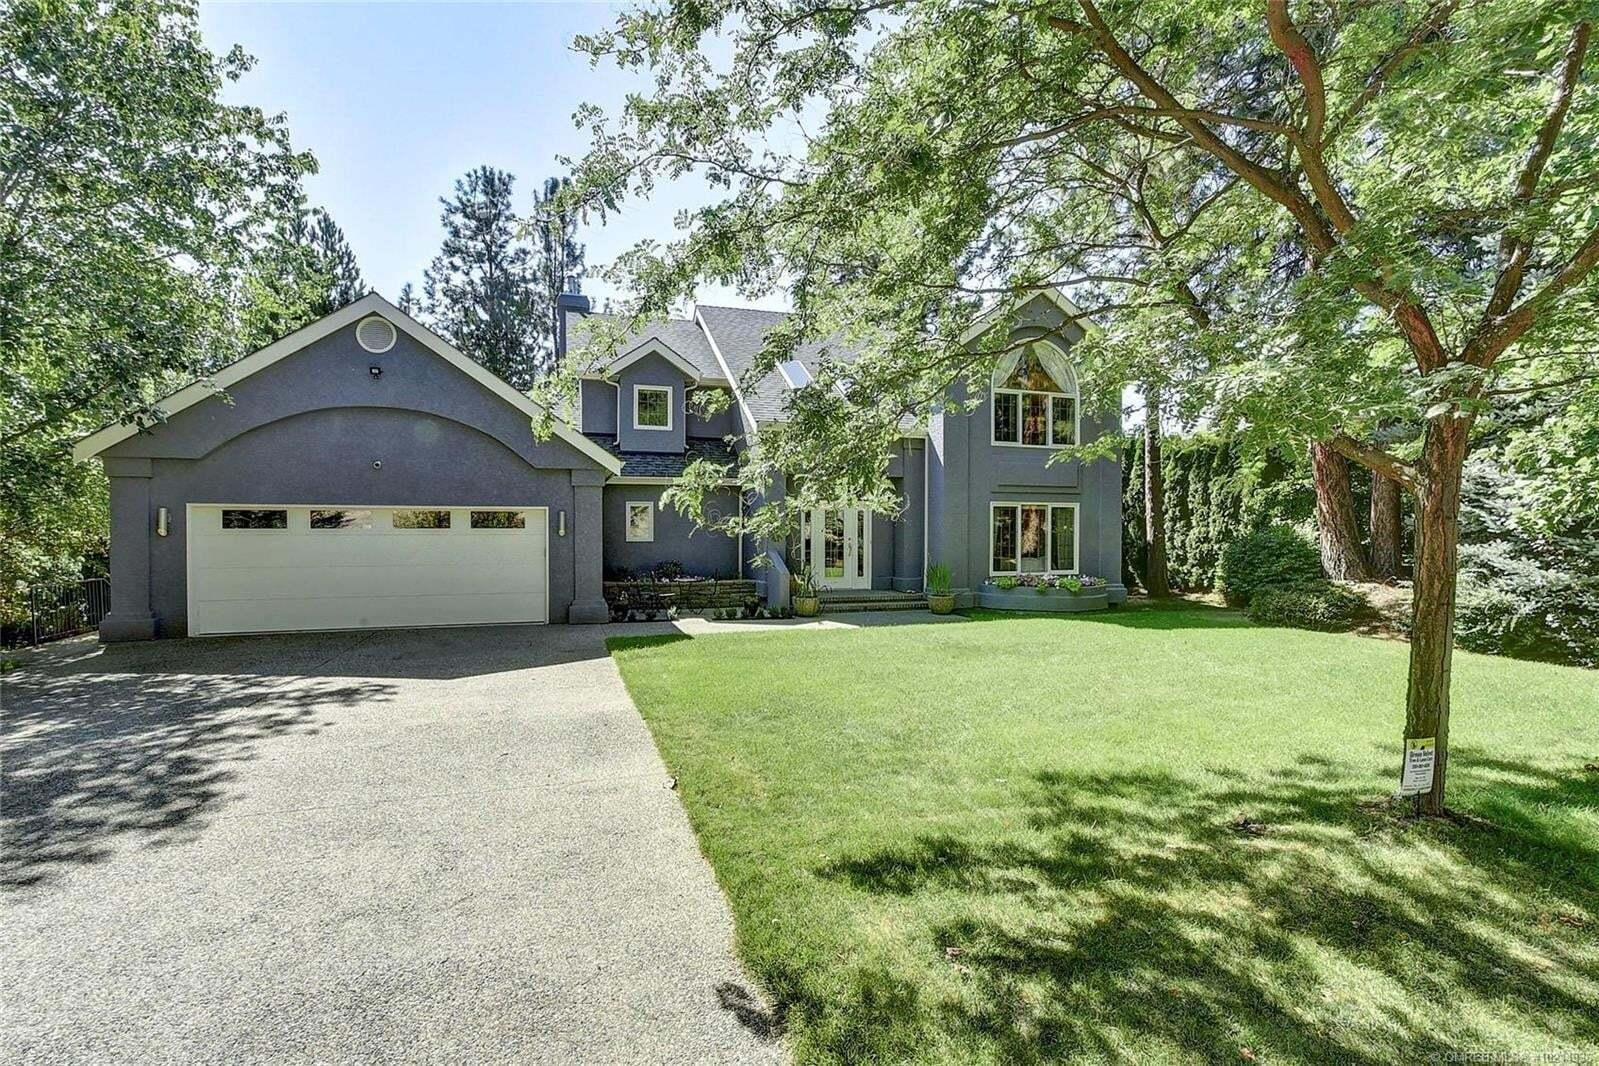 House for sale at 3926 Hyak Rd Kelowna British Columbia - MLS: 10214336